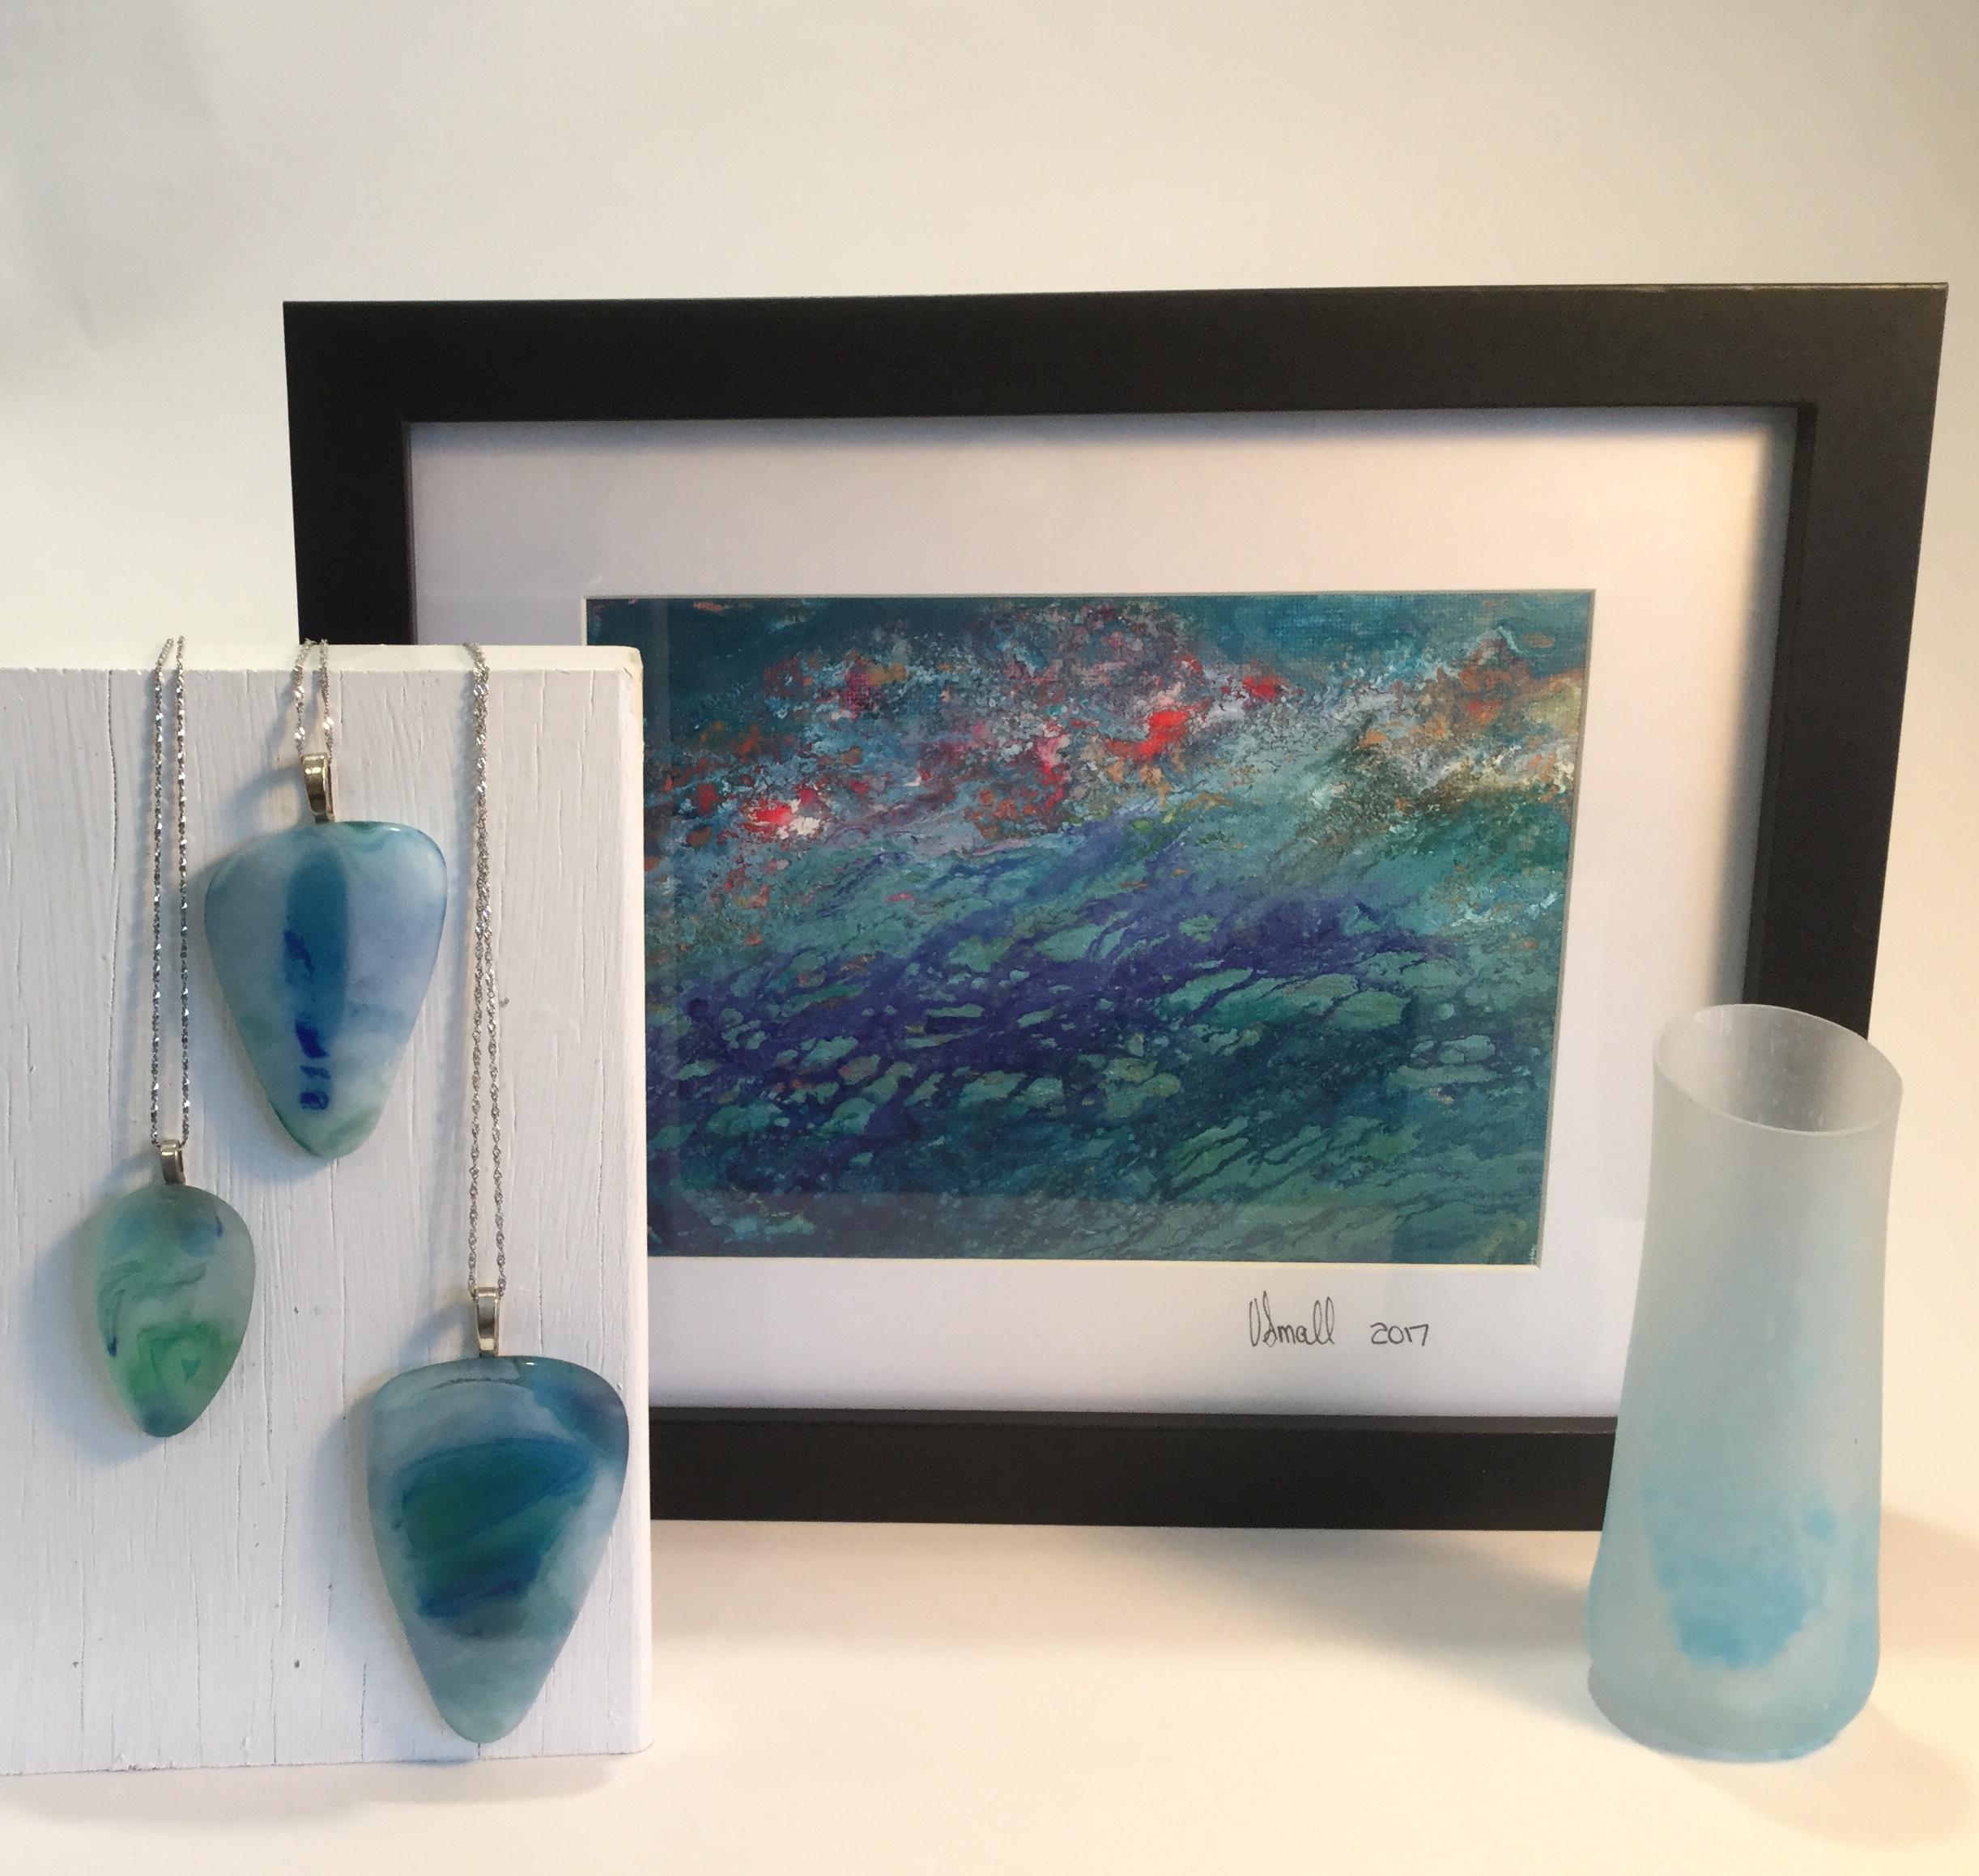 VSmall_Pendants-glass_-Lilly-Pond-_-Ink-Low-tide_slumped-glass.jpg